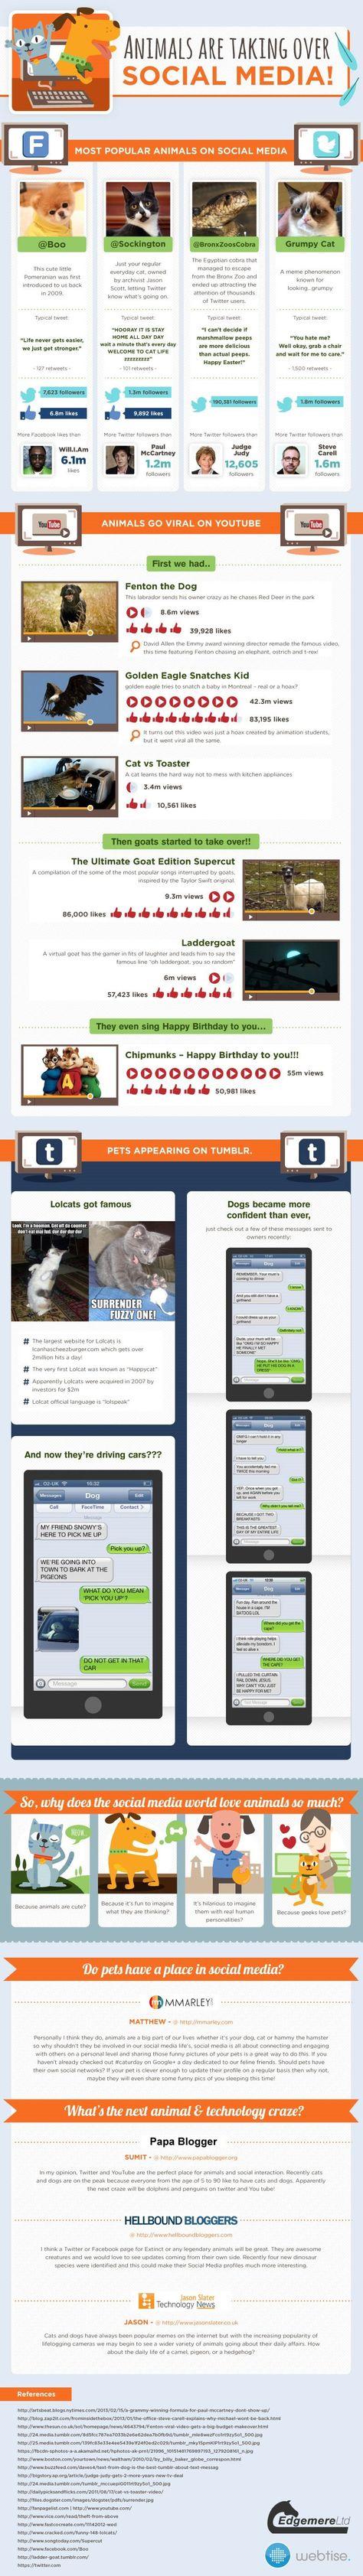 Animals Taking Over Social Media